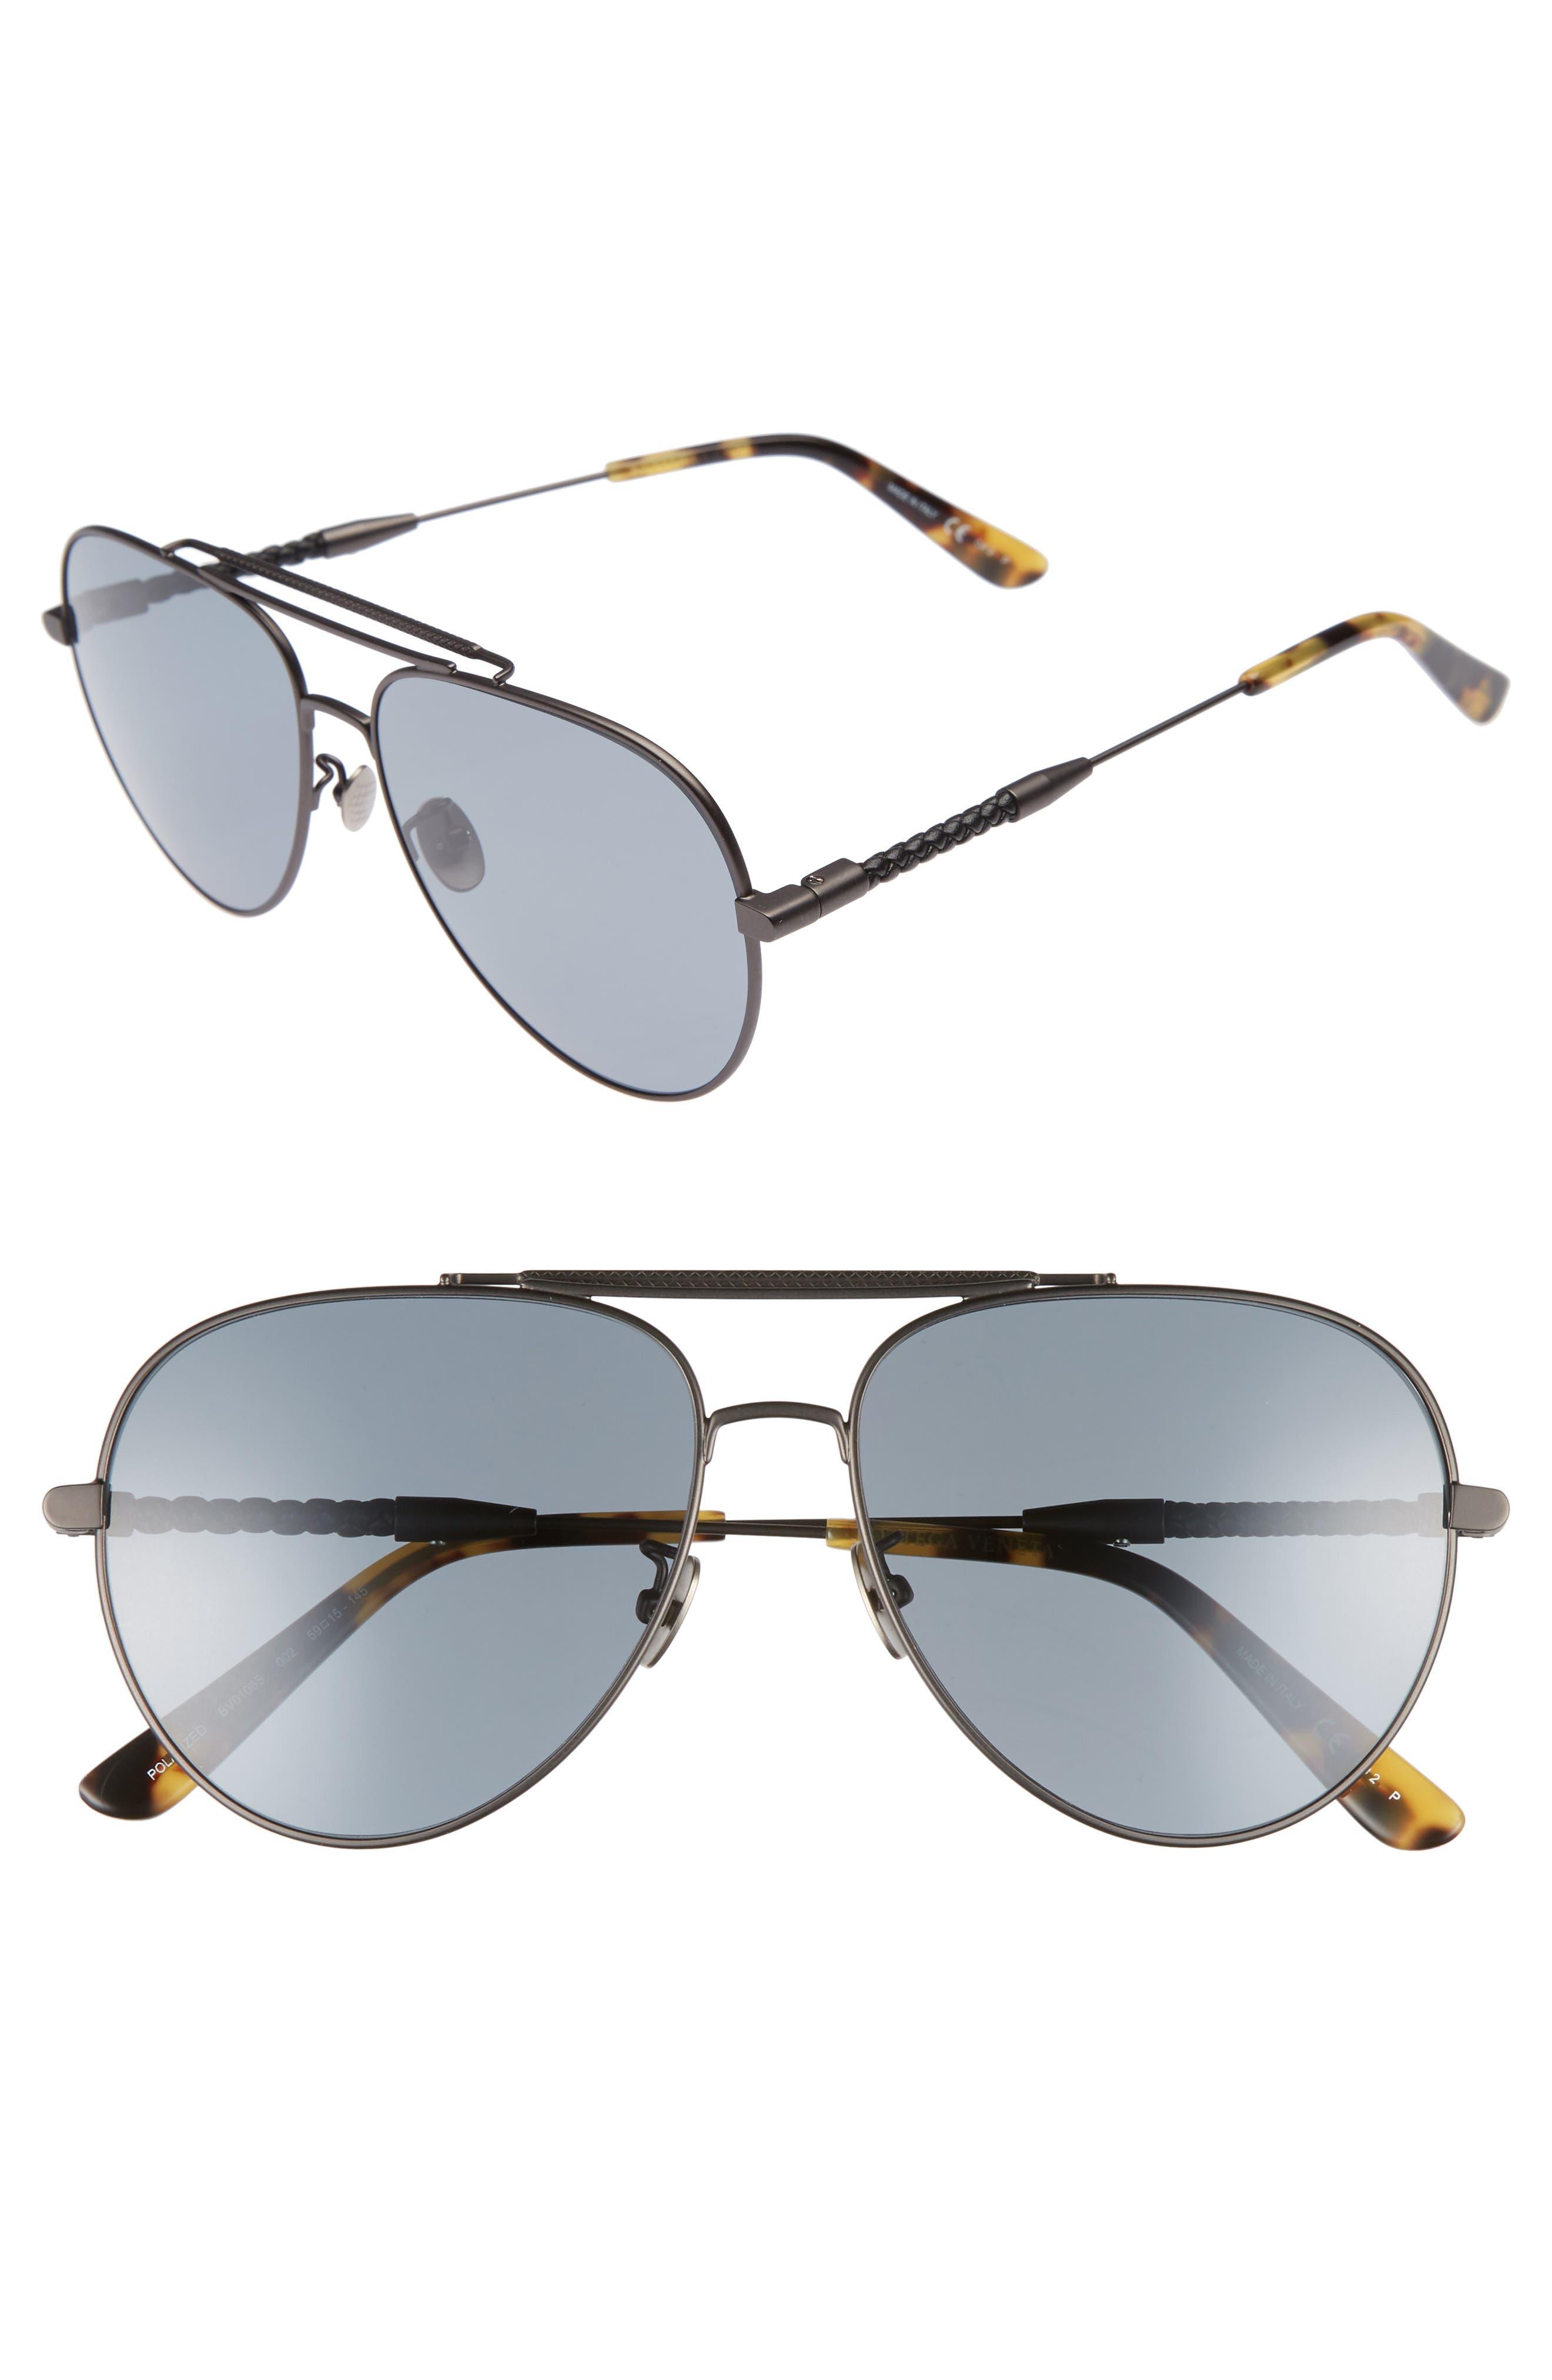 Alternate Image 1 Selected - Bottega Veneta 59m Polarized Aviator Sunglasses